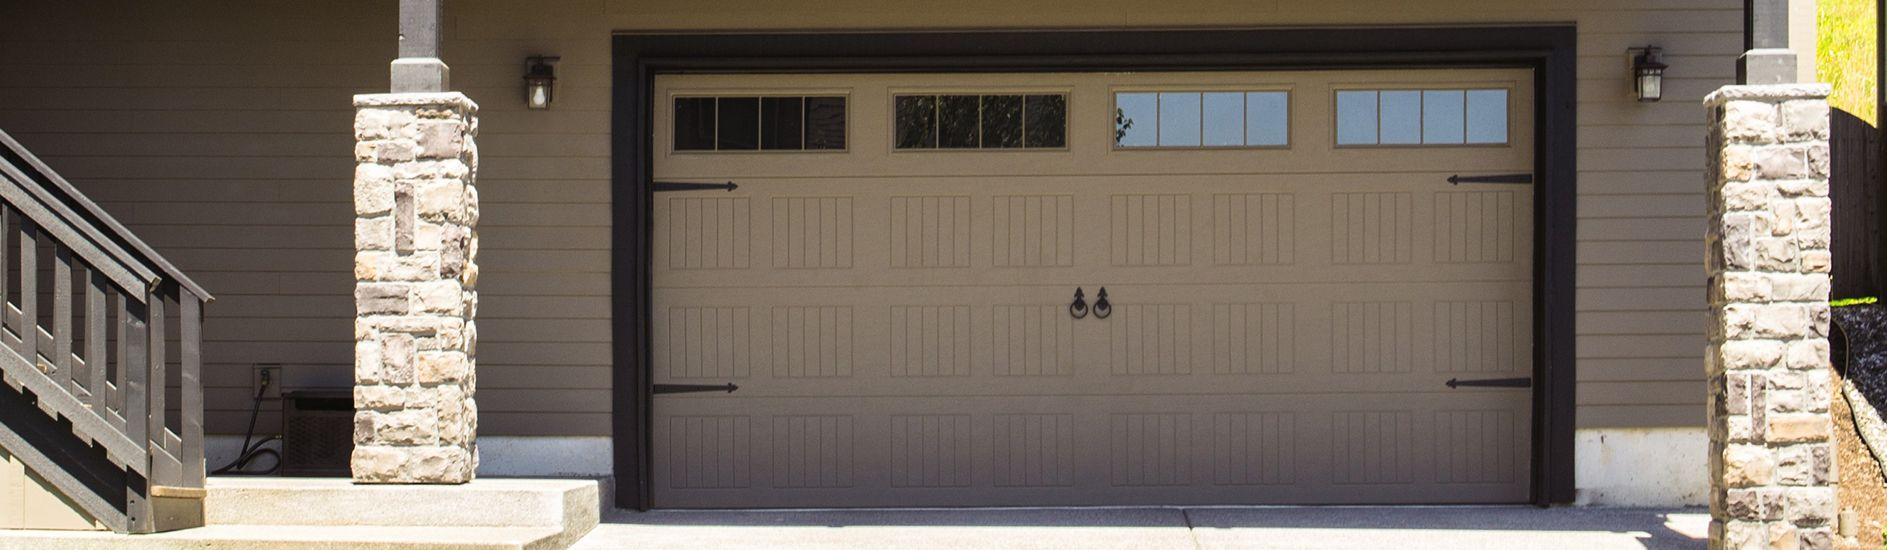 medium resolution of 9100 9600 steel garage door sonoma taupe stockbridge